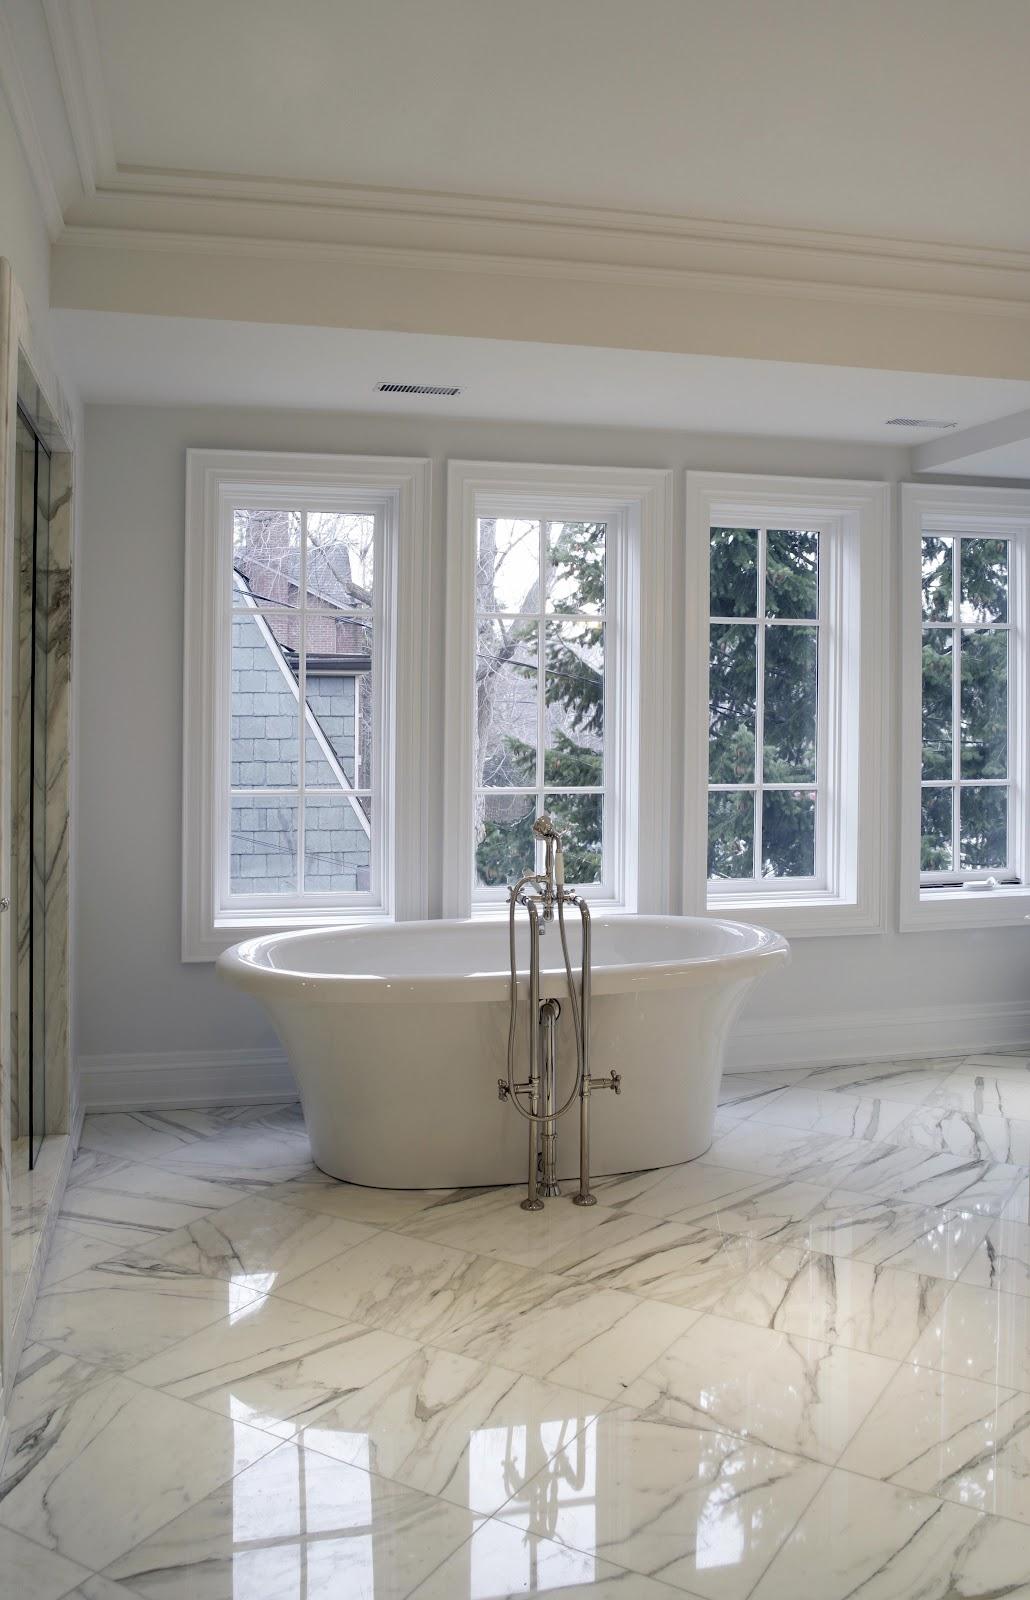 Marble Floor Cleaning Polishing Sealing Weybridge Surrey: Marble Floor Cleaning « Marble Floor Cleaning